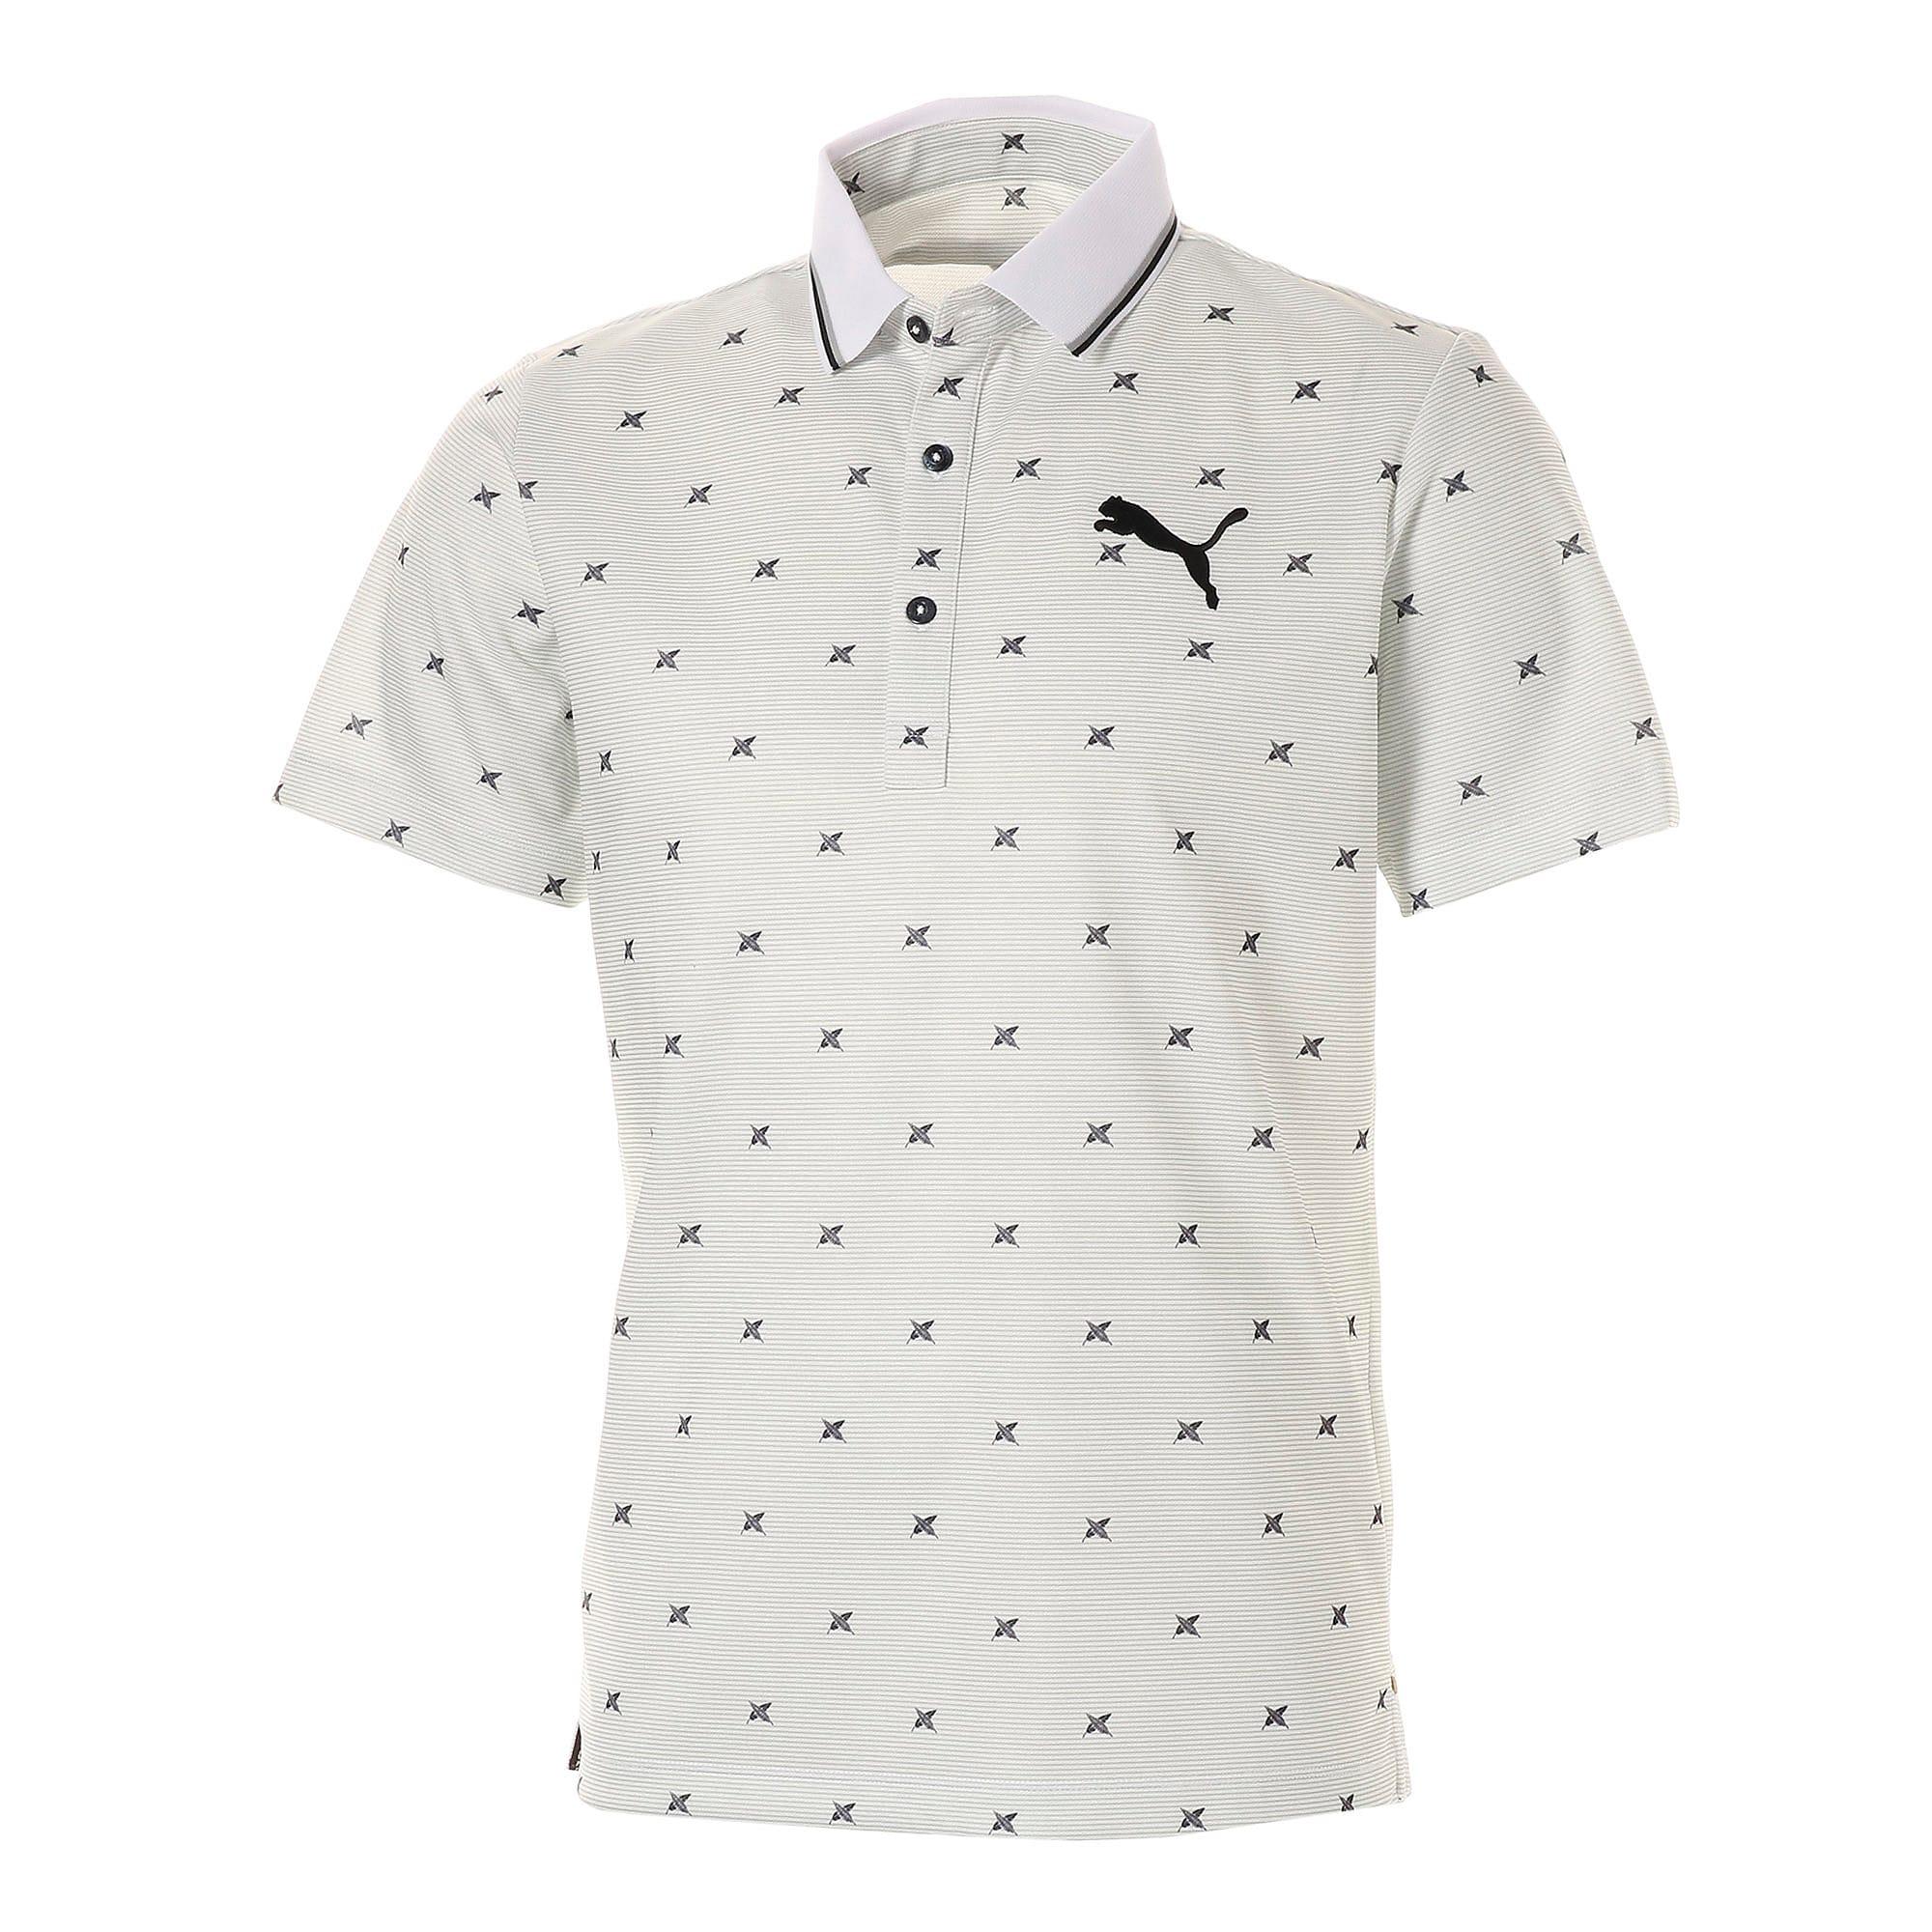 Thumbnail 1 of ゴルフ フェザーフュージョン SSポロシャツ 半袖, Bright White, medium-JPN